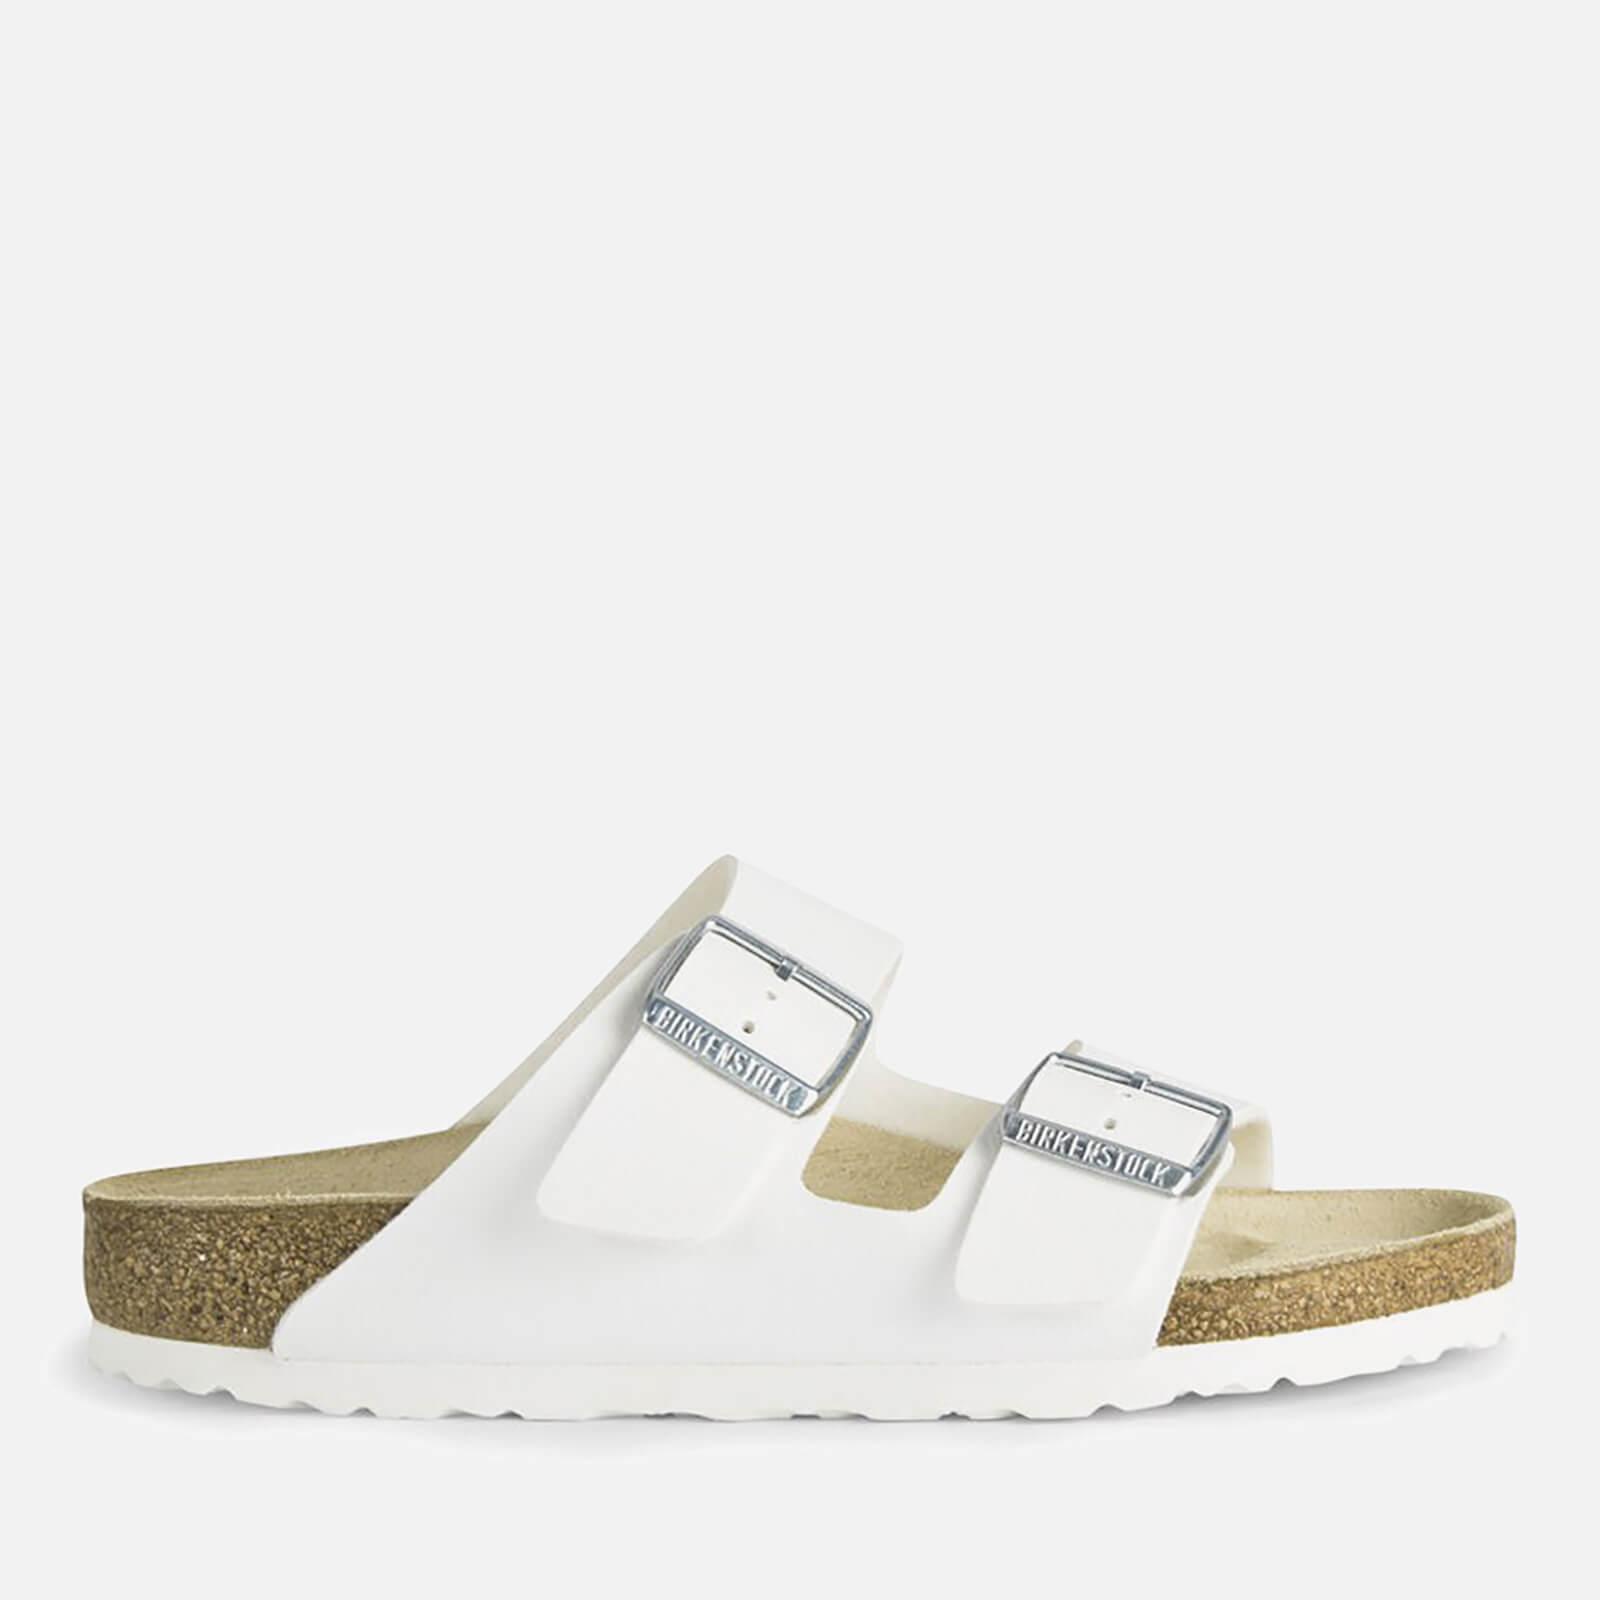 Birkenstock Women's Arizona Slim Fit Double Strap Sandals - White - EU 39/UK 5.5